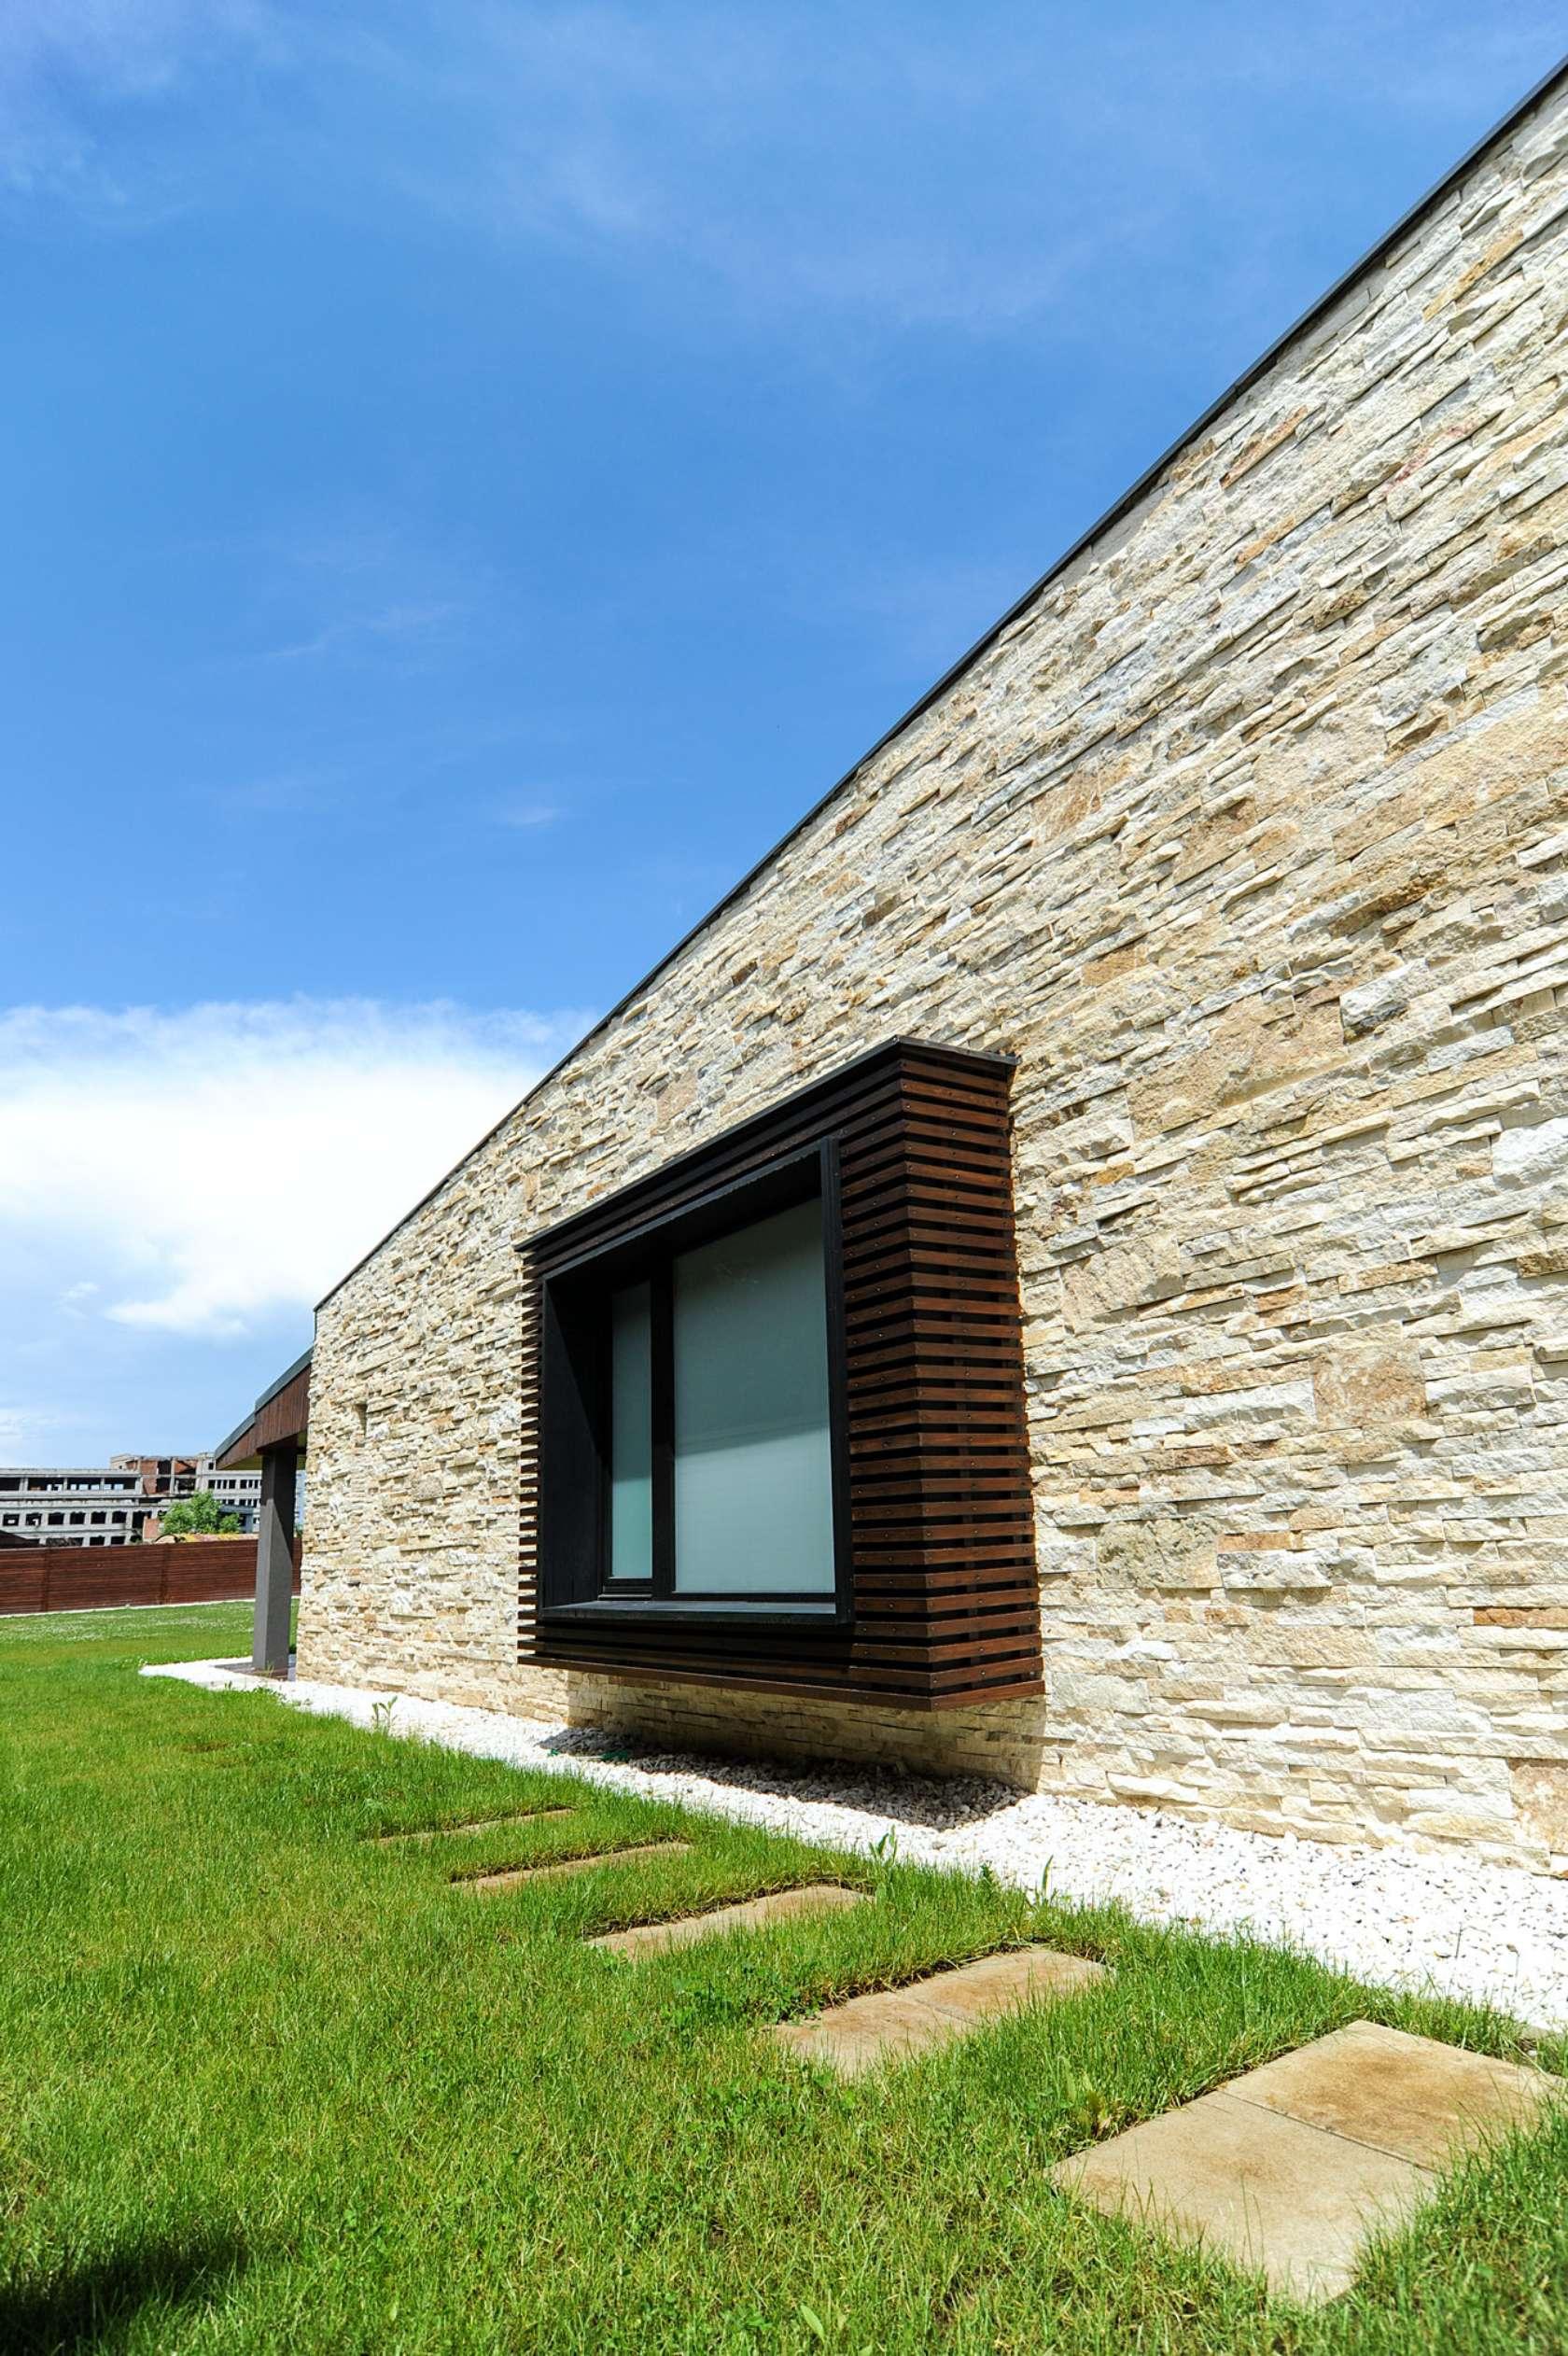 Dise o de casa moderna de dos pisos fachadas y planos - Construccion casas de piedra ...